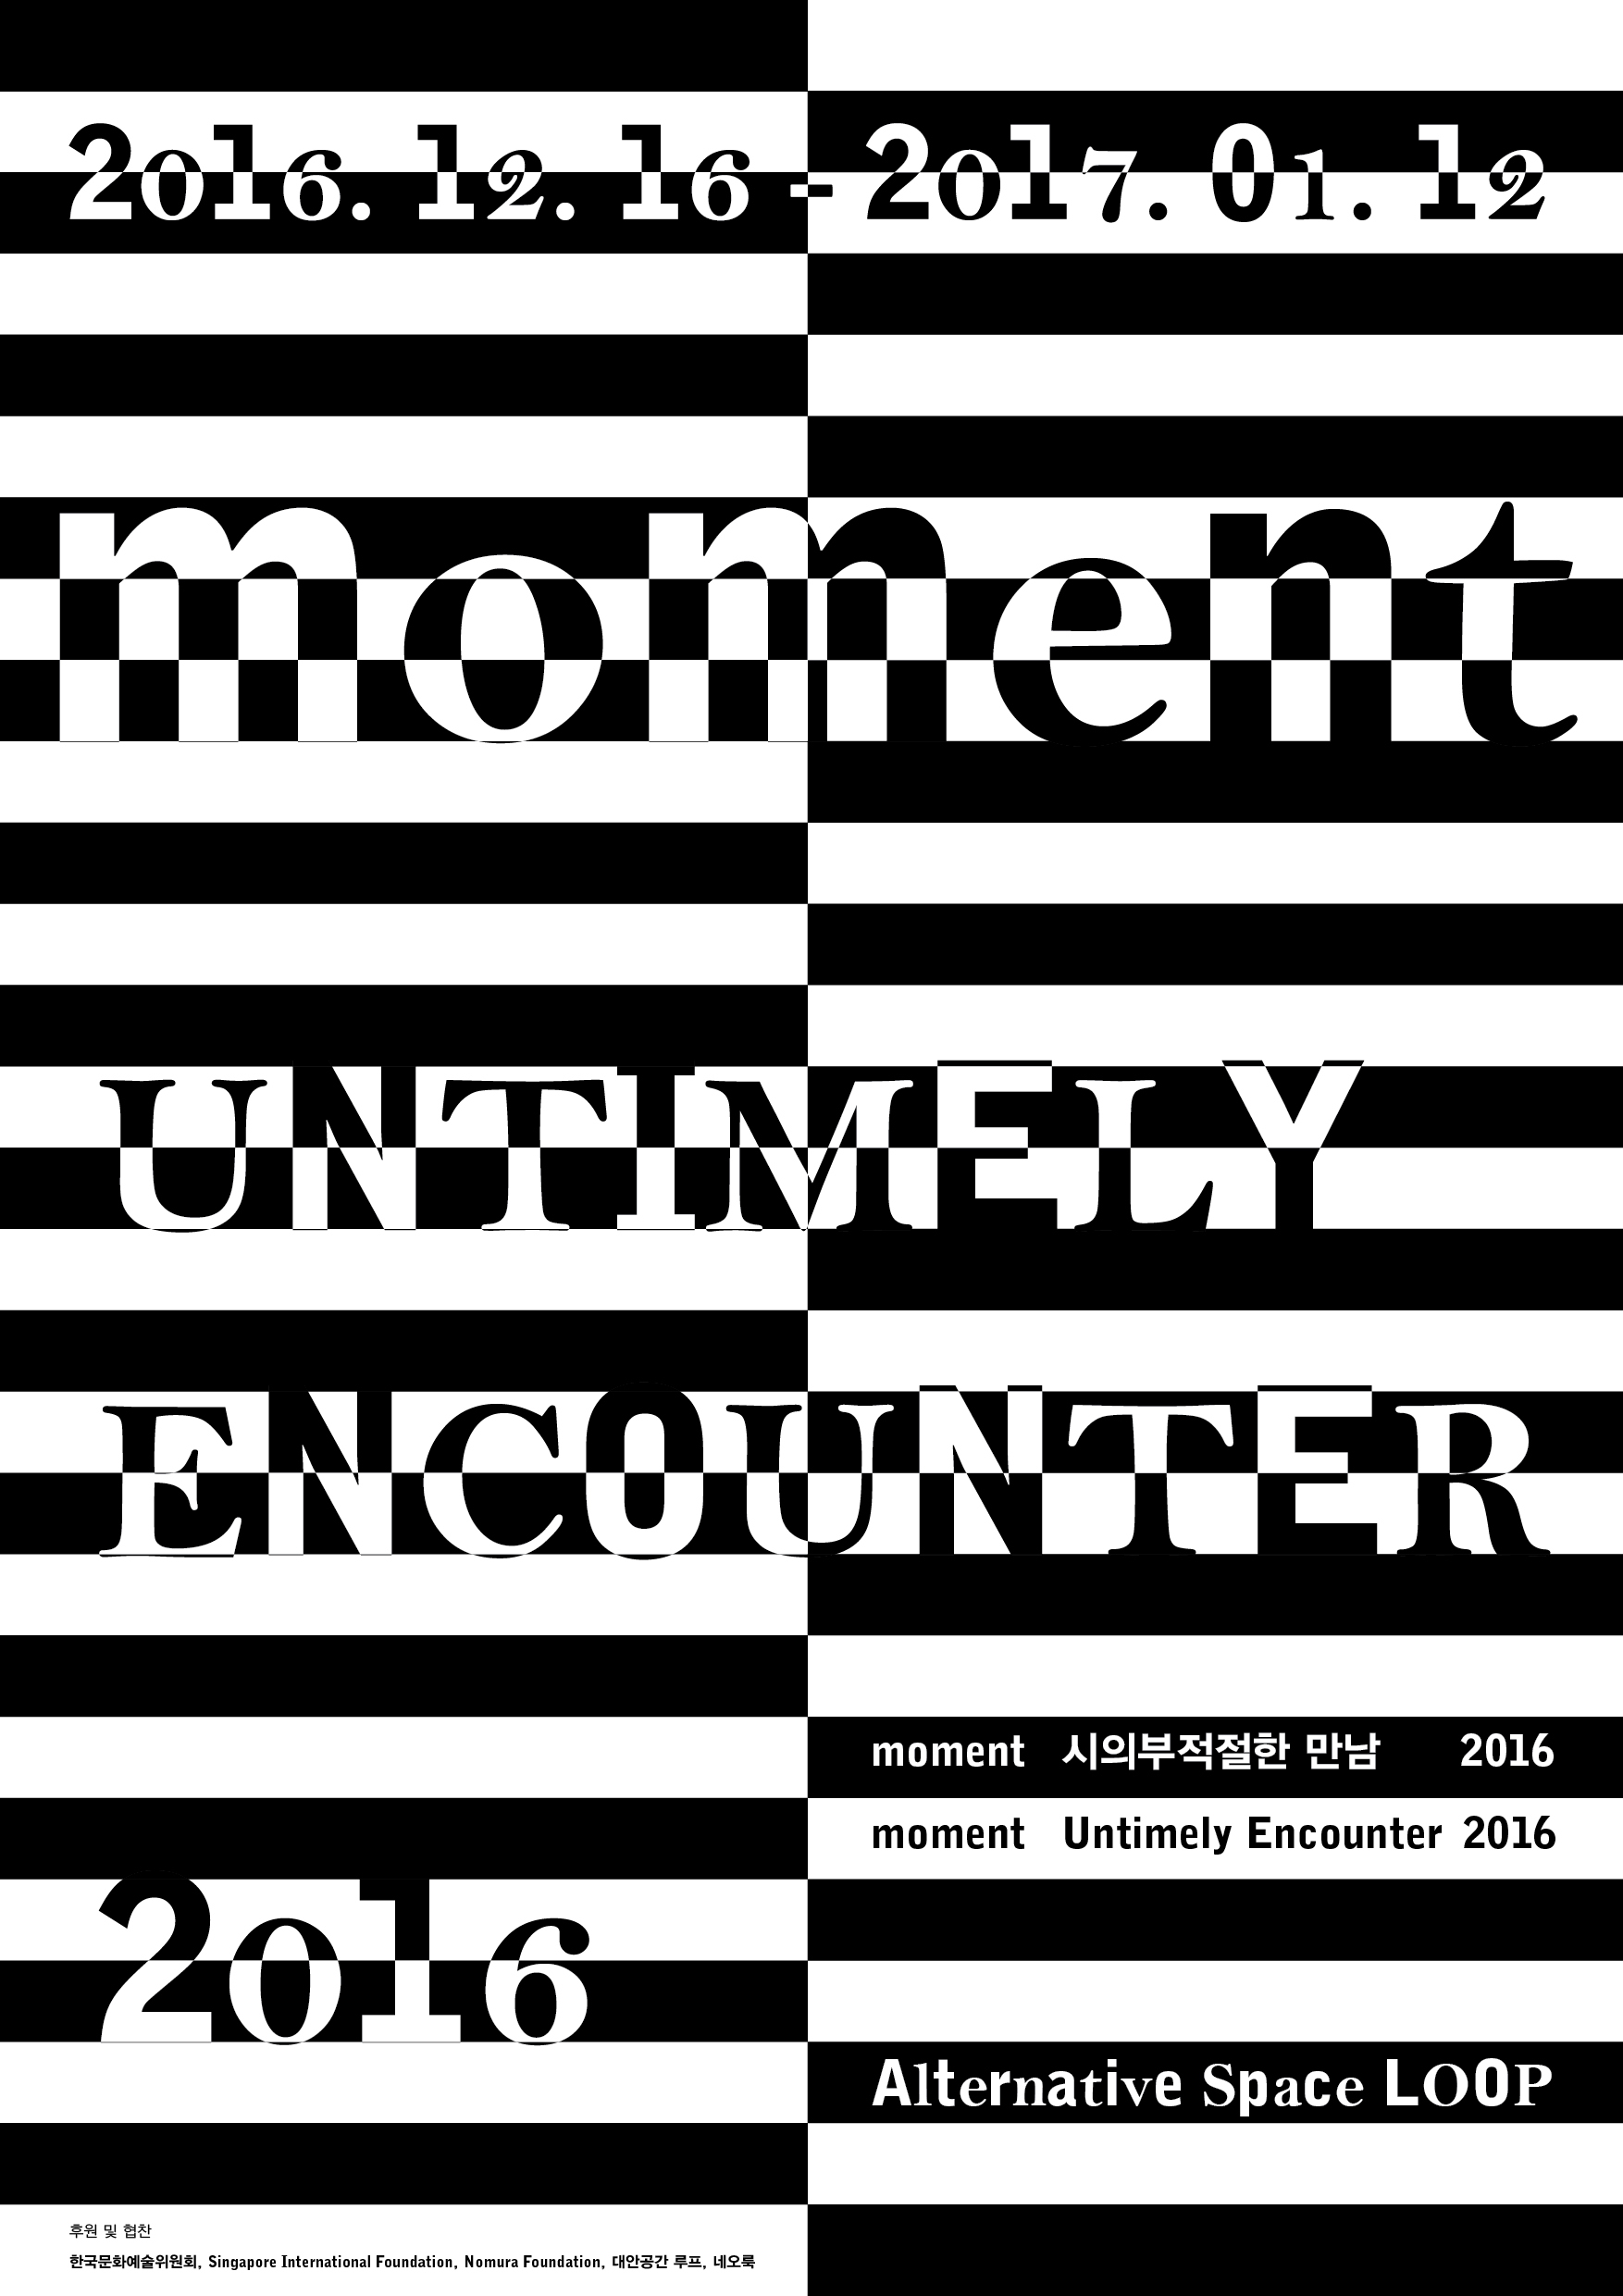 Moment Untimely Encounter 2016: Seungwook Koh, Minja Gu, Jaebum Kim, Kai Lam, Loo Zihan, Bani Haykal, Ryudai Takano, Satoko Nema